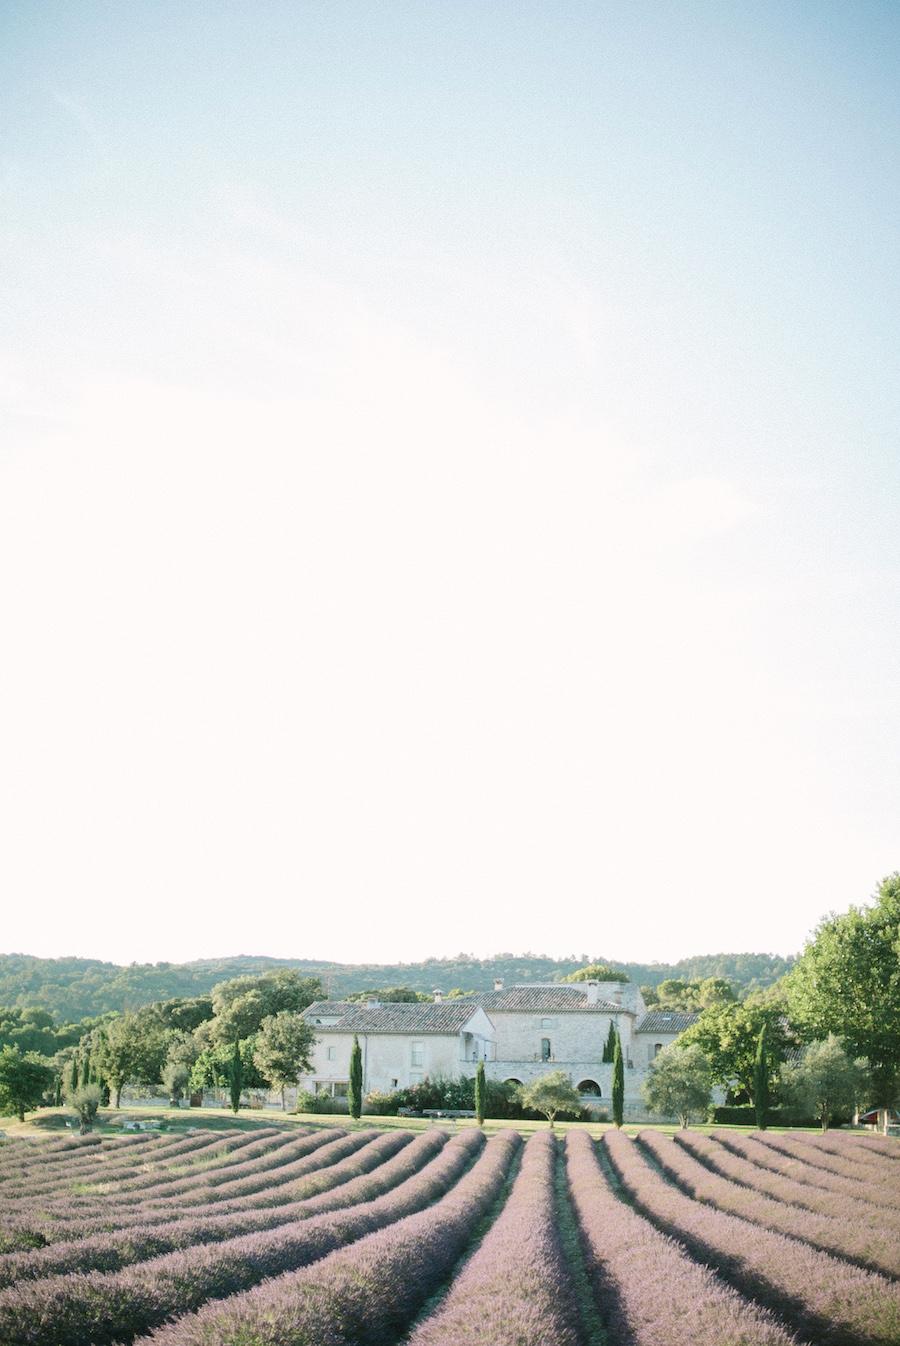 saya-photography-rustic-french-wedding-provence-domaines-de-patras-9.jpg